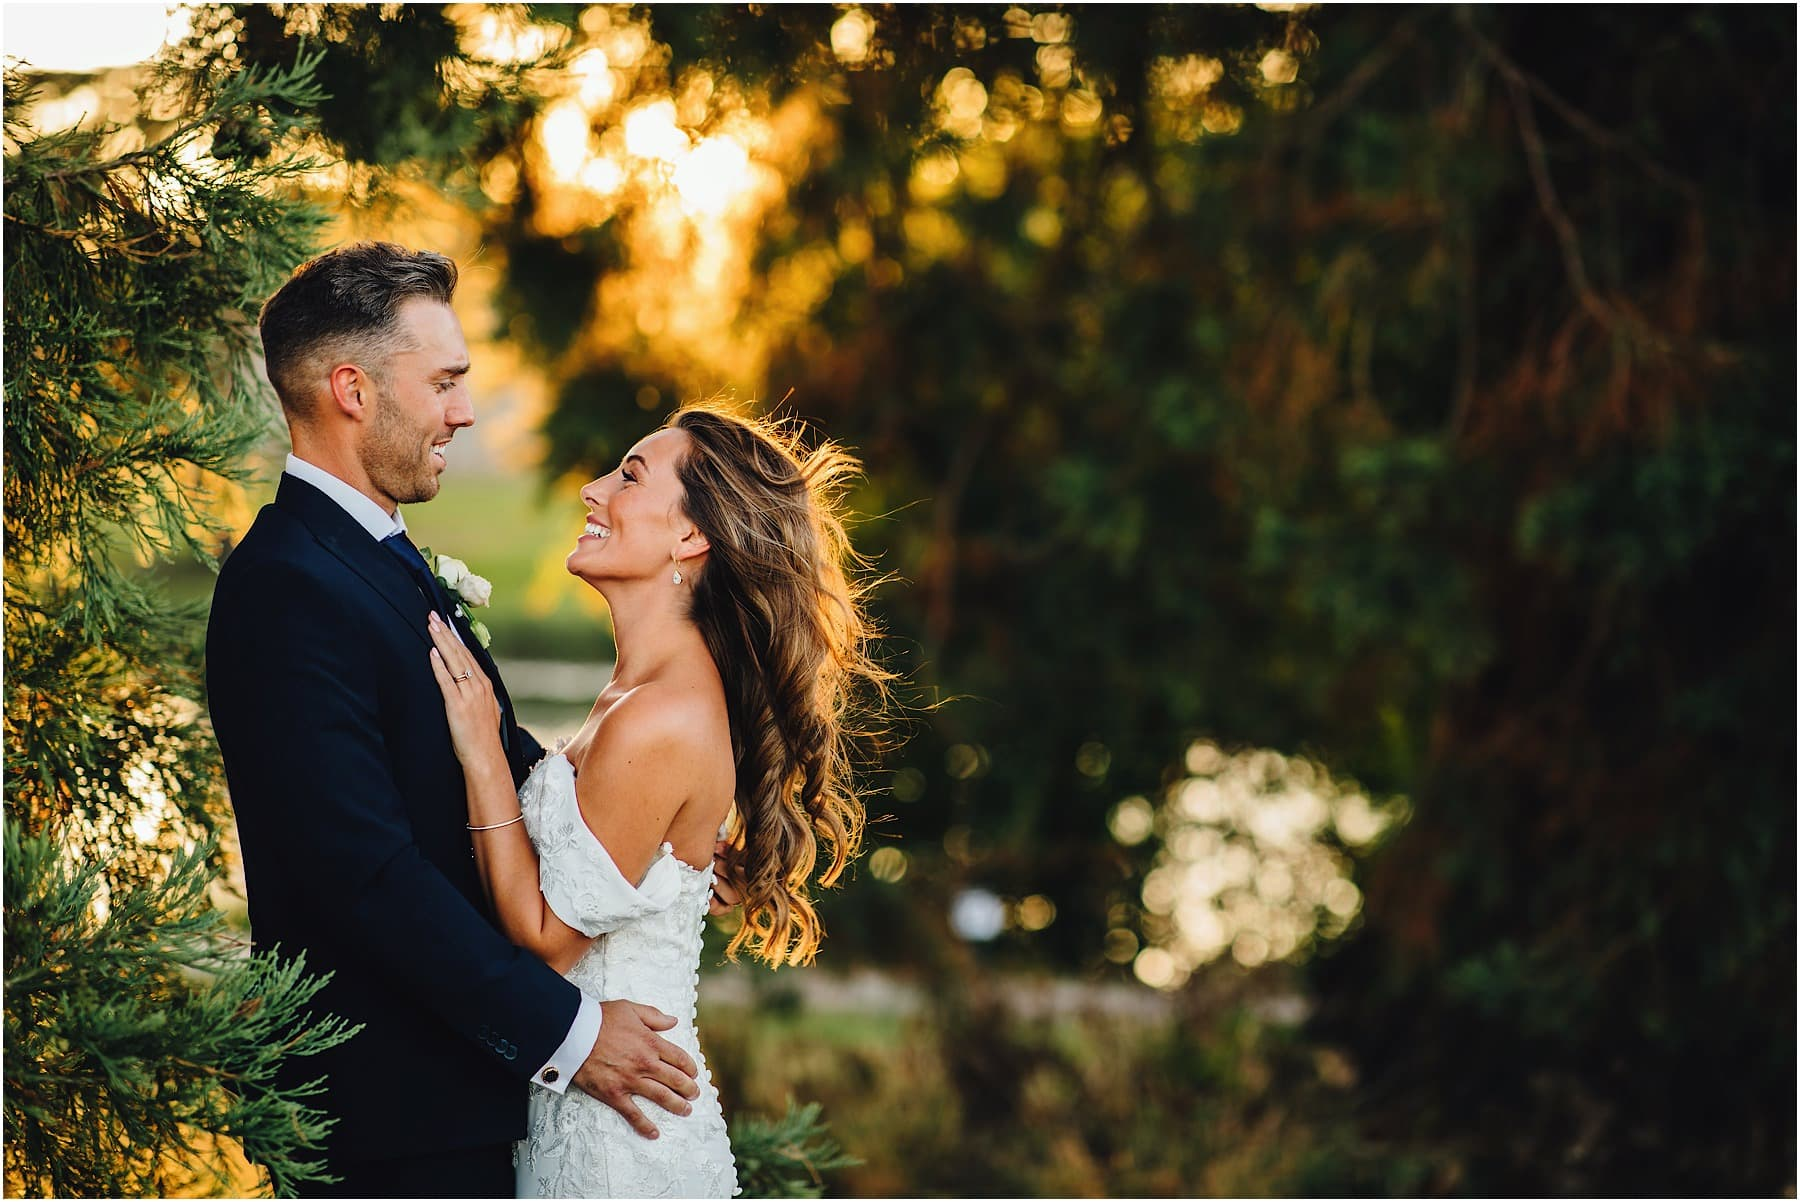 Compton Verney Wedding Photographer